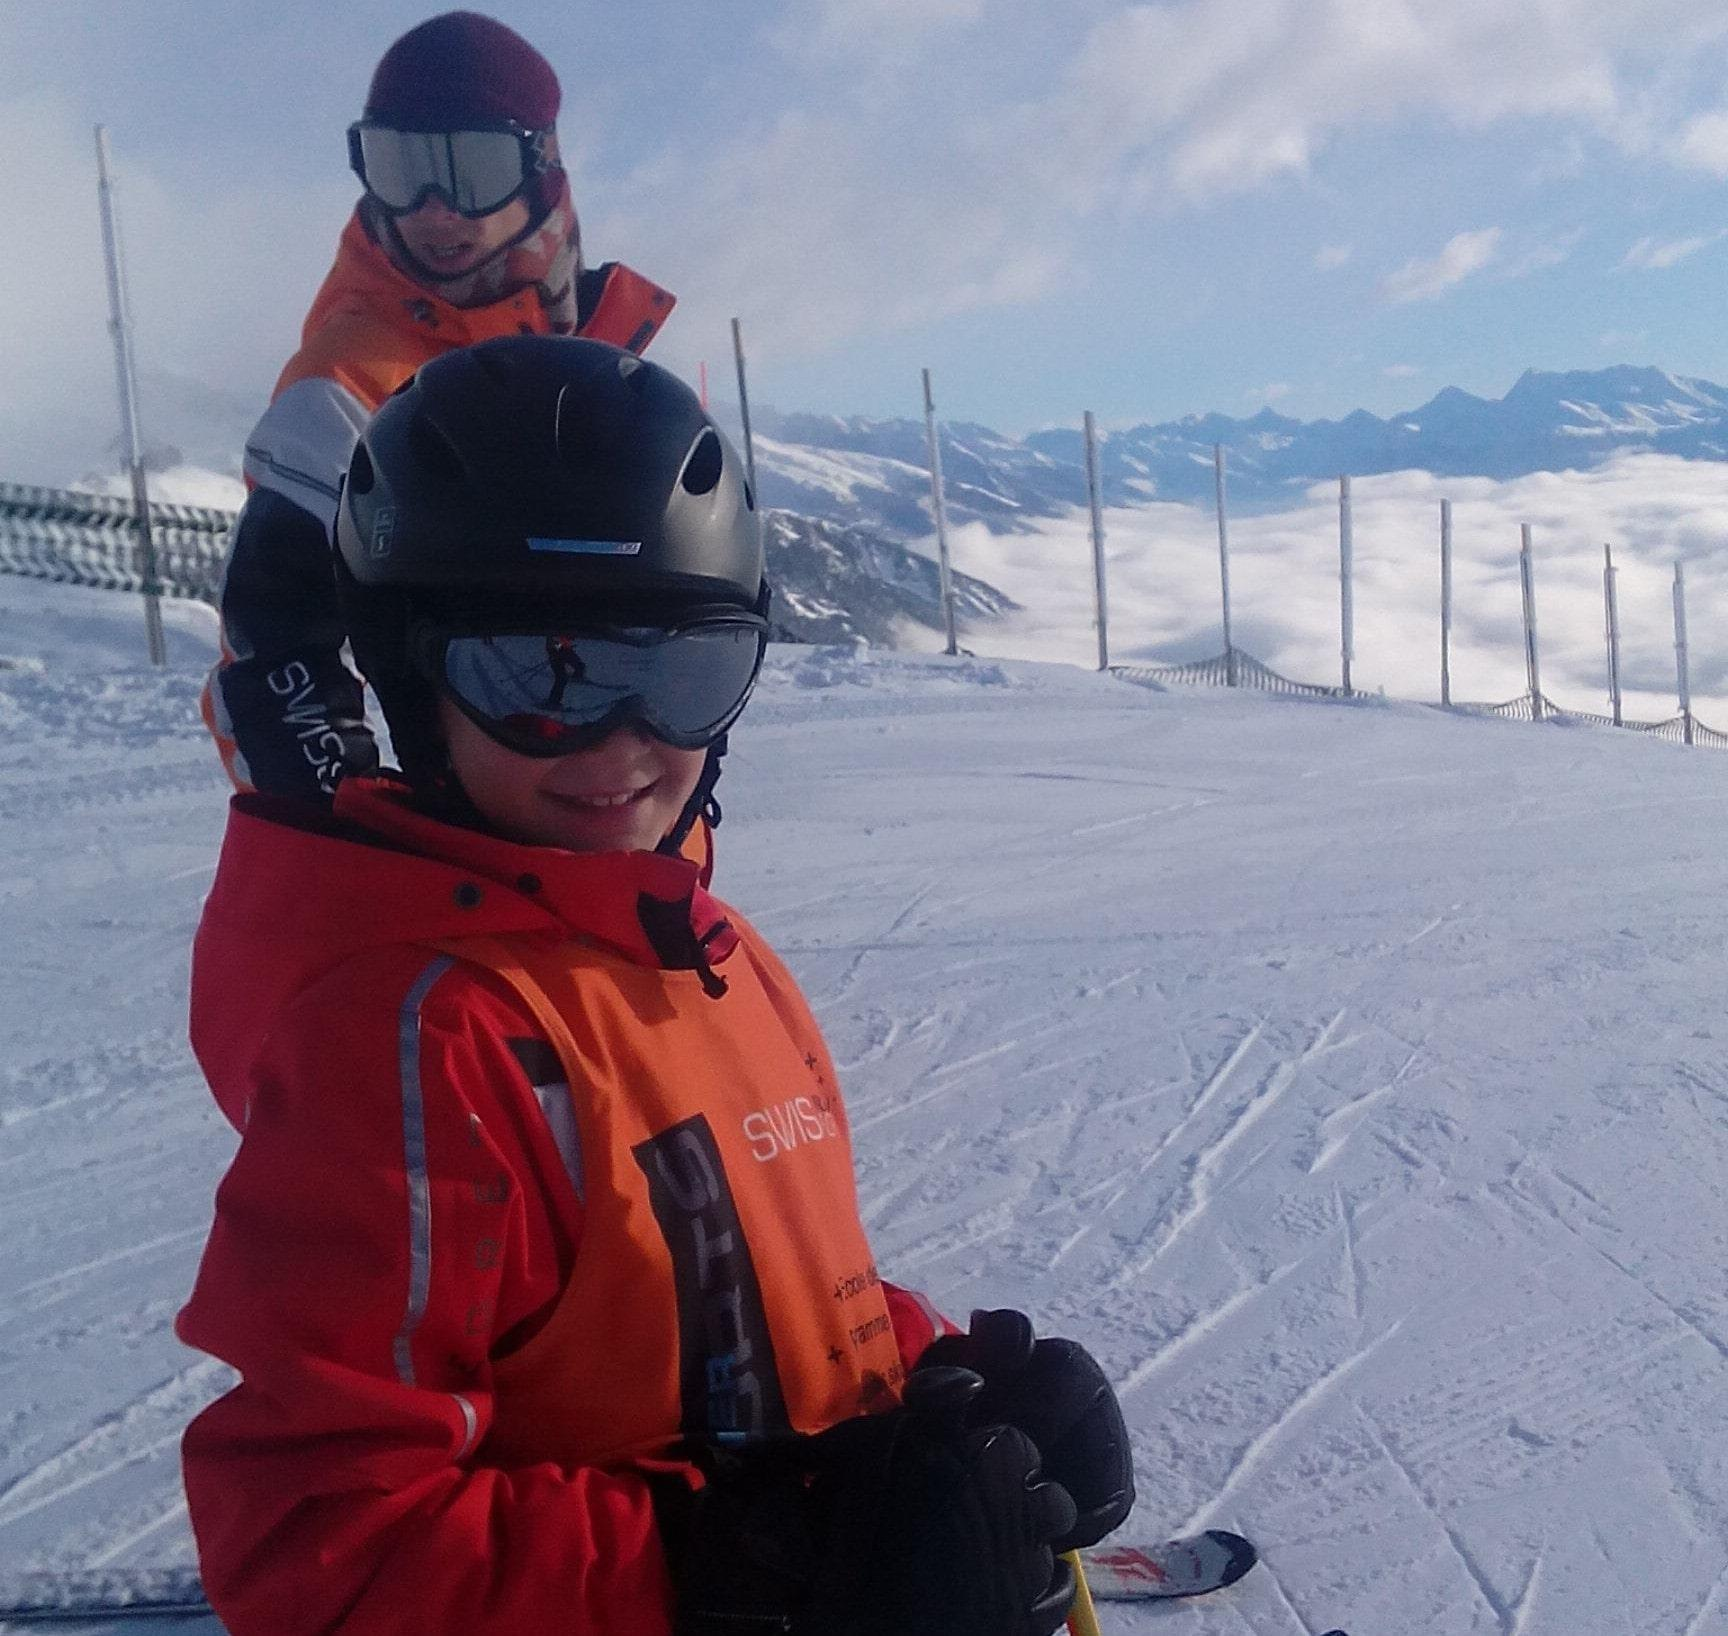 Cours de ski Ados (12-15 ans) - Max 5 - Crans